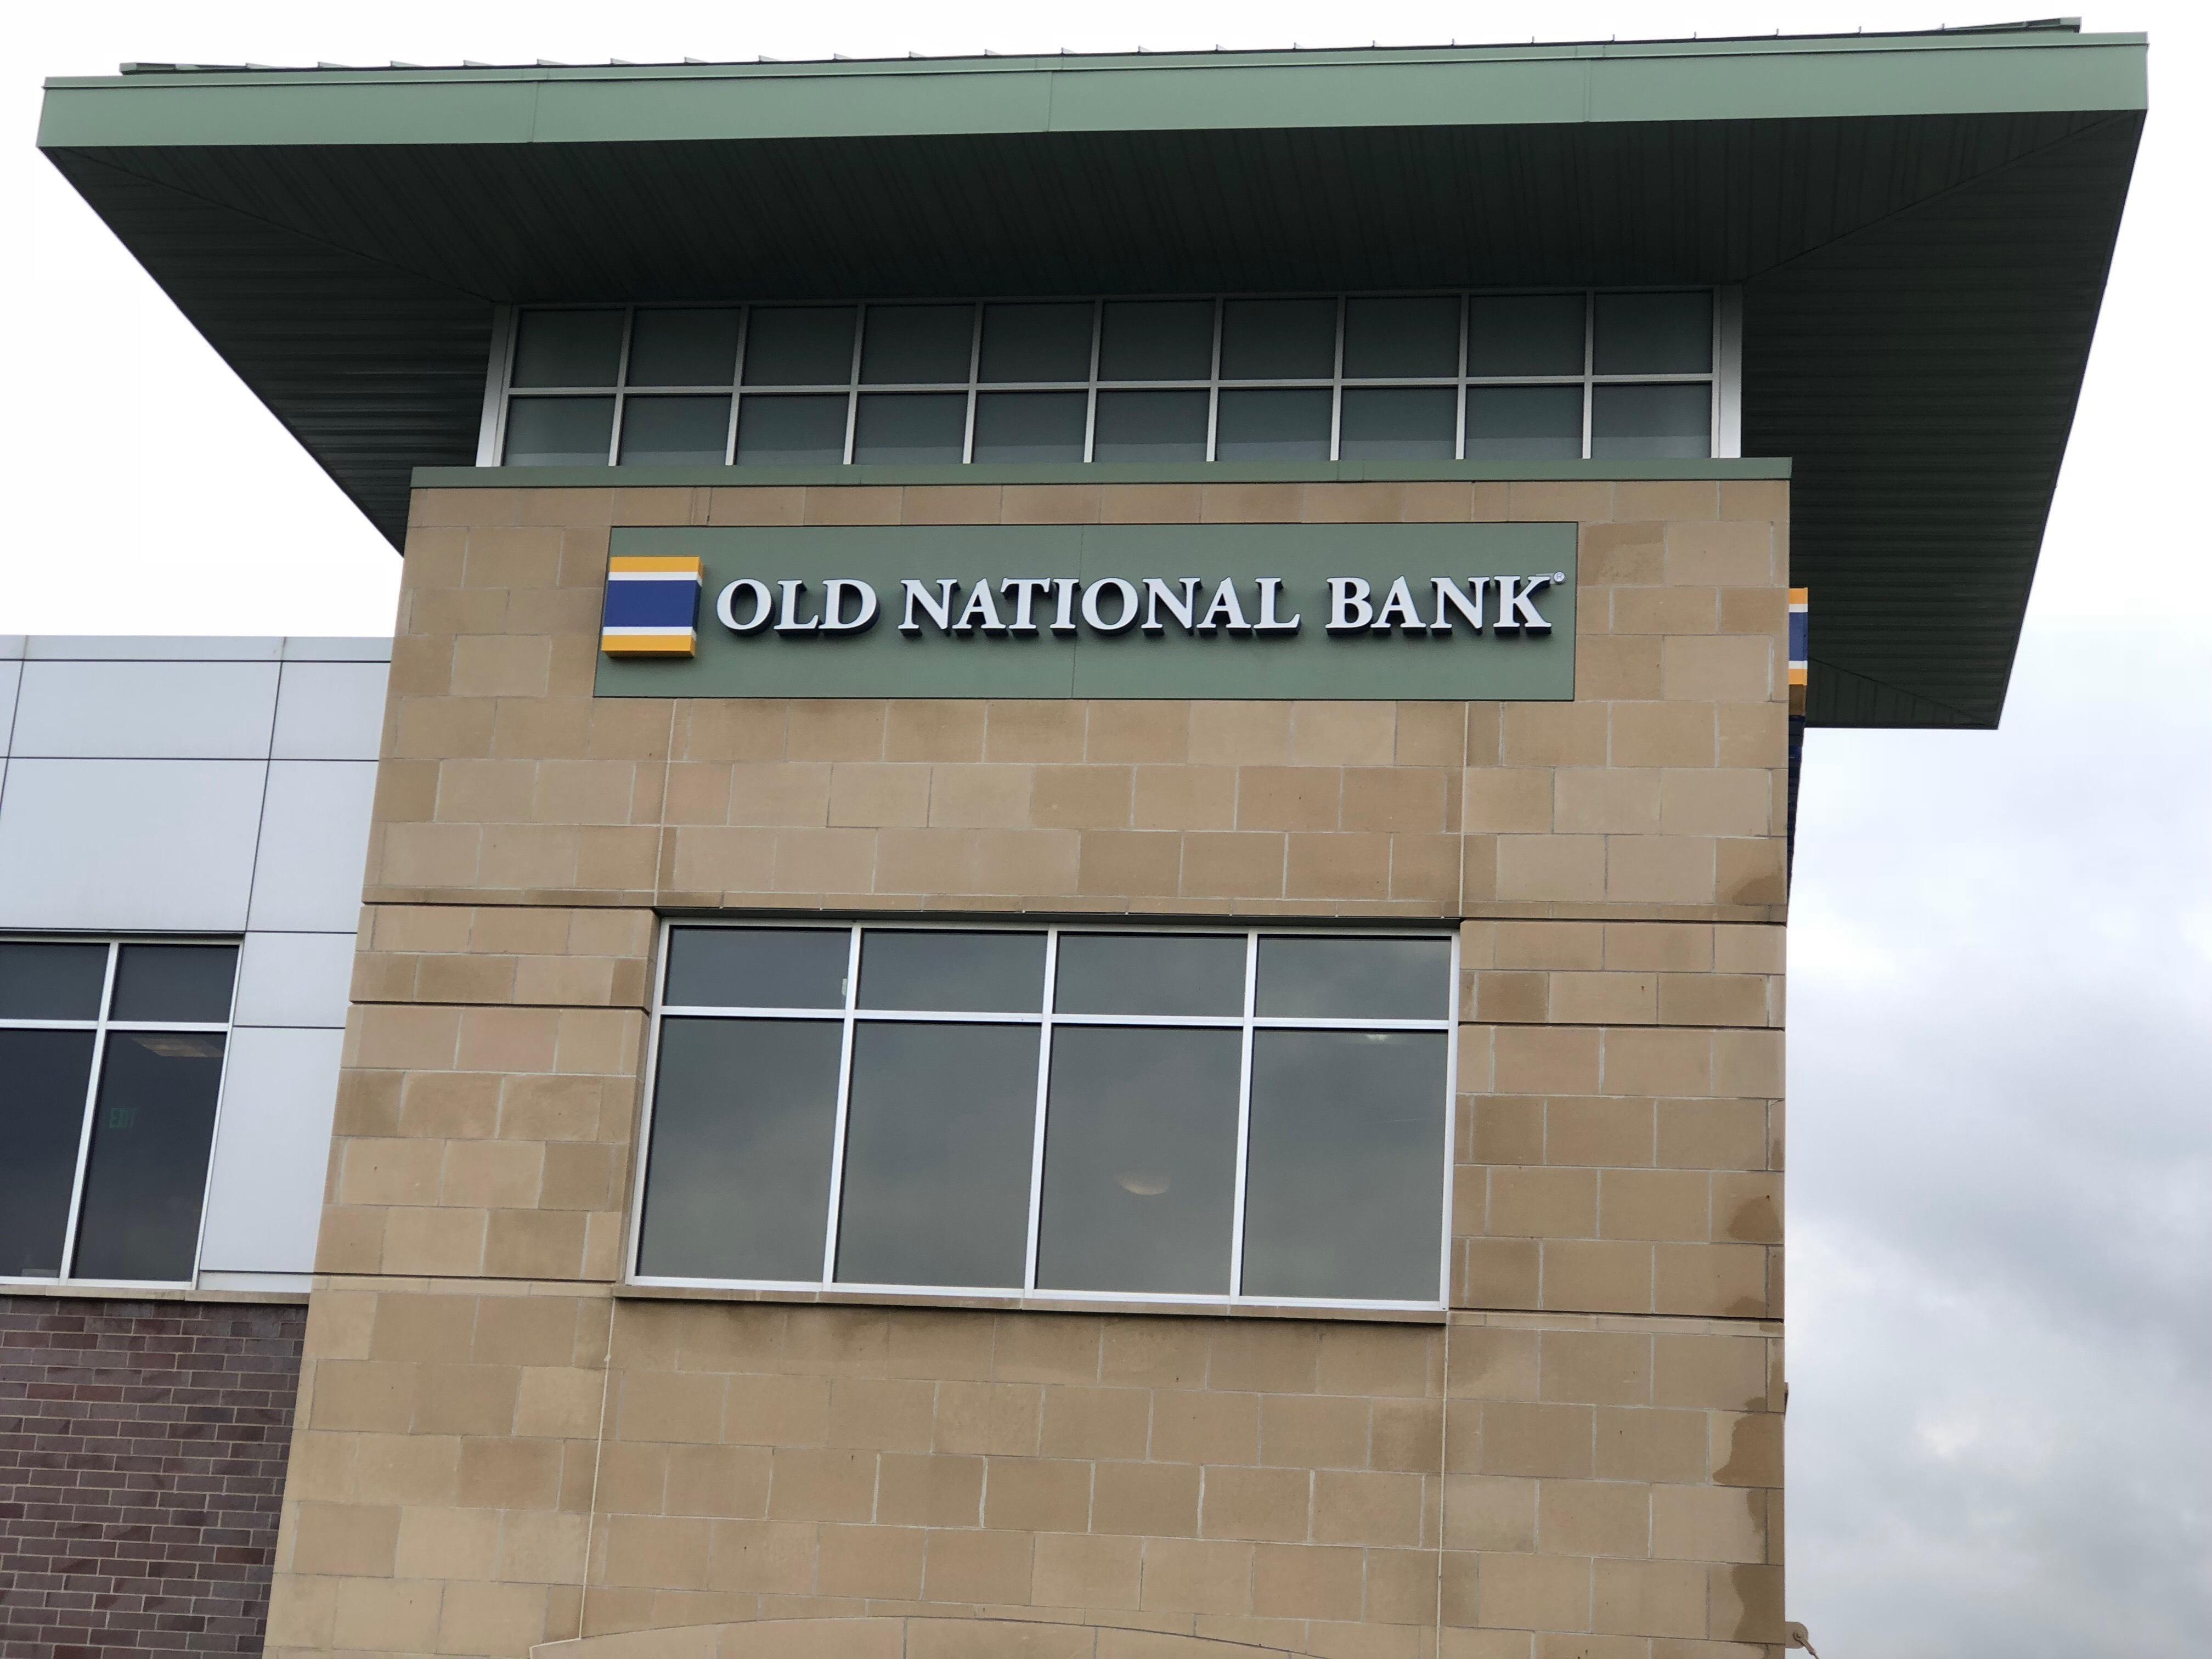 Old National Bank image 1